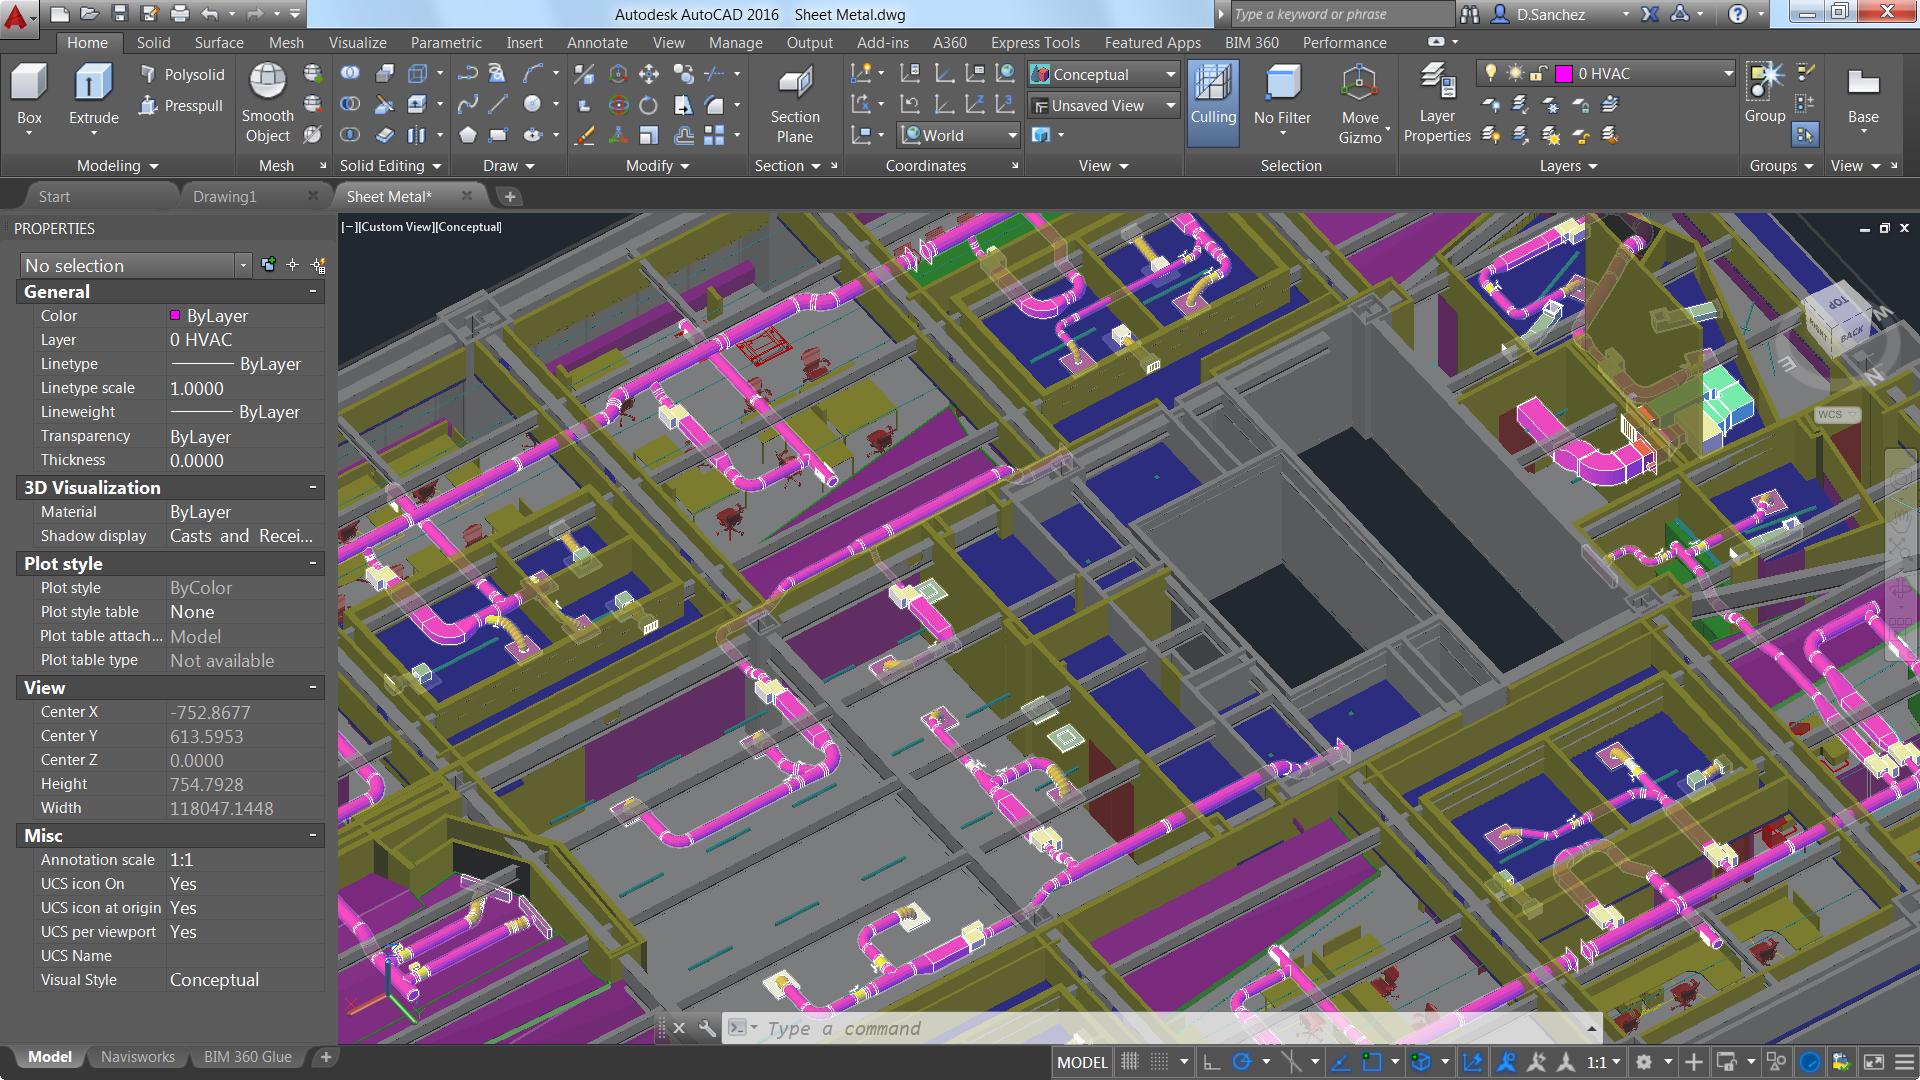 Una schermata di Autodesk Building Suite 2016